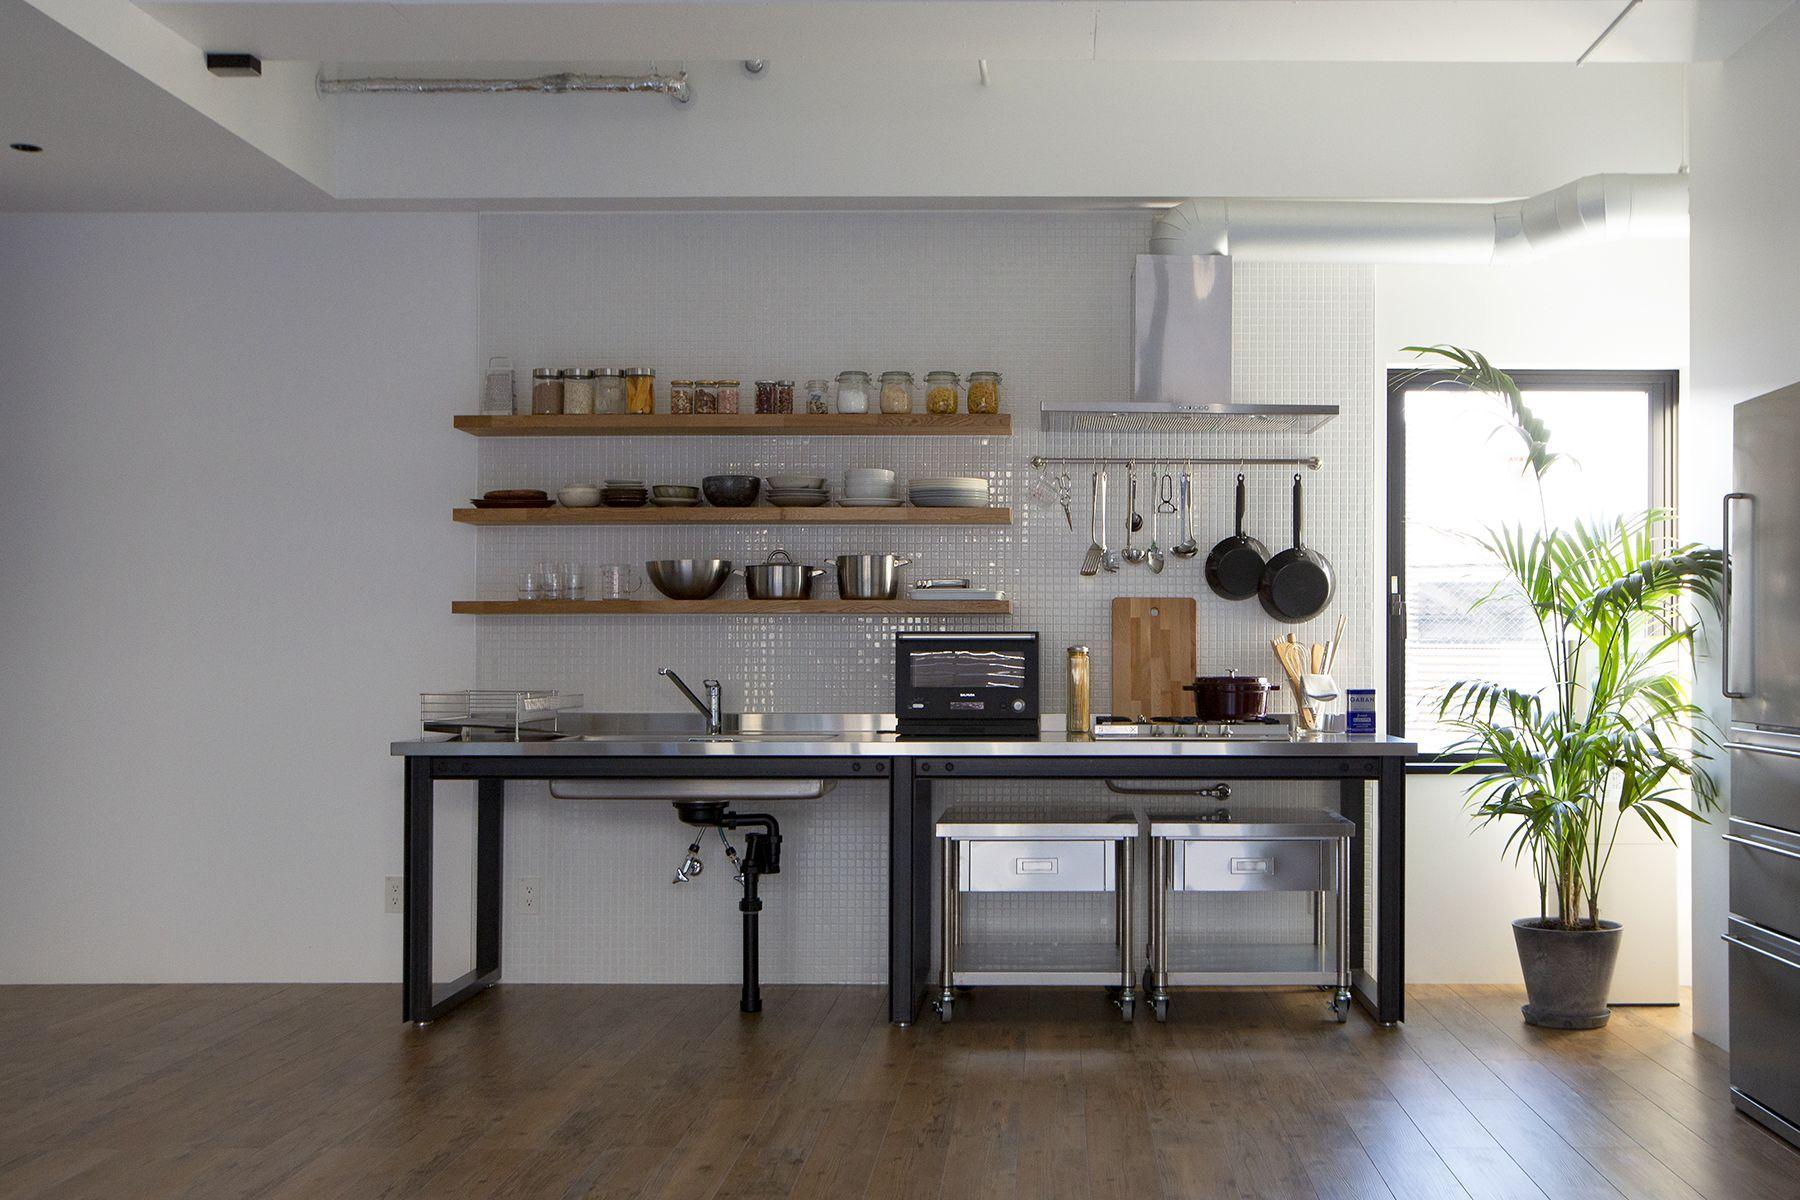 OPRCT Space P (オプレクト)キッチン / 大きなダイニングテーブ�